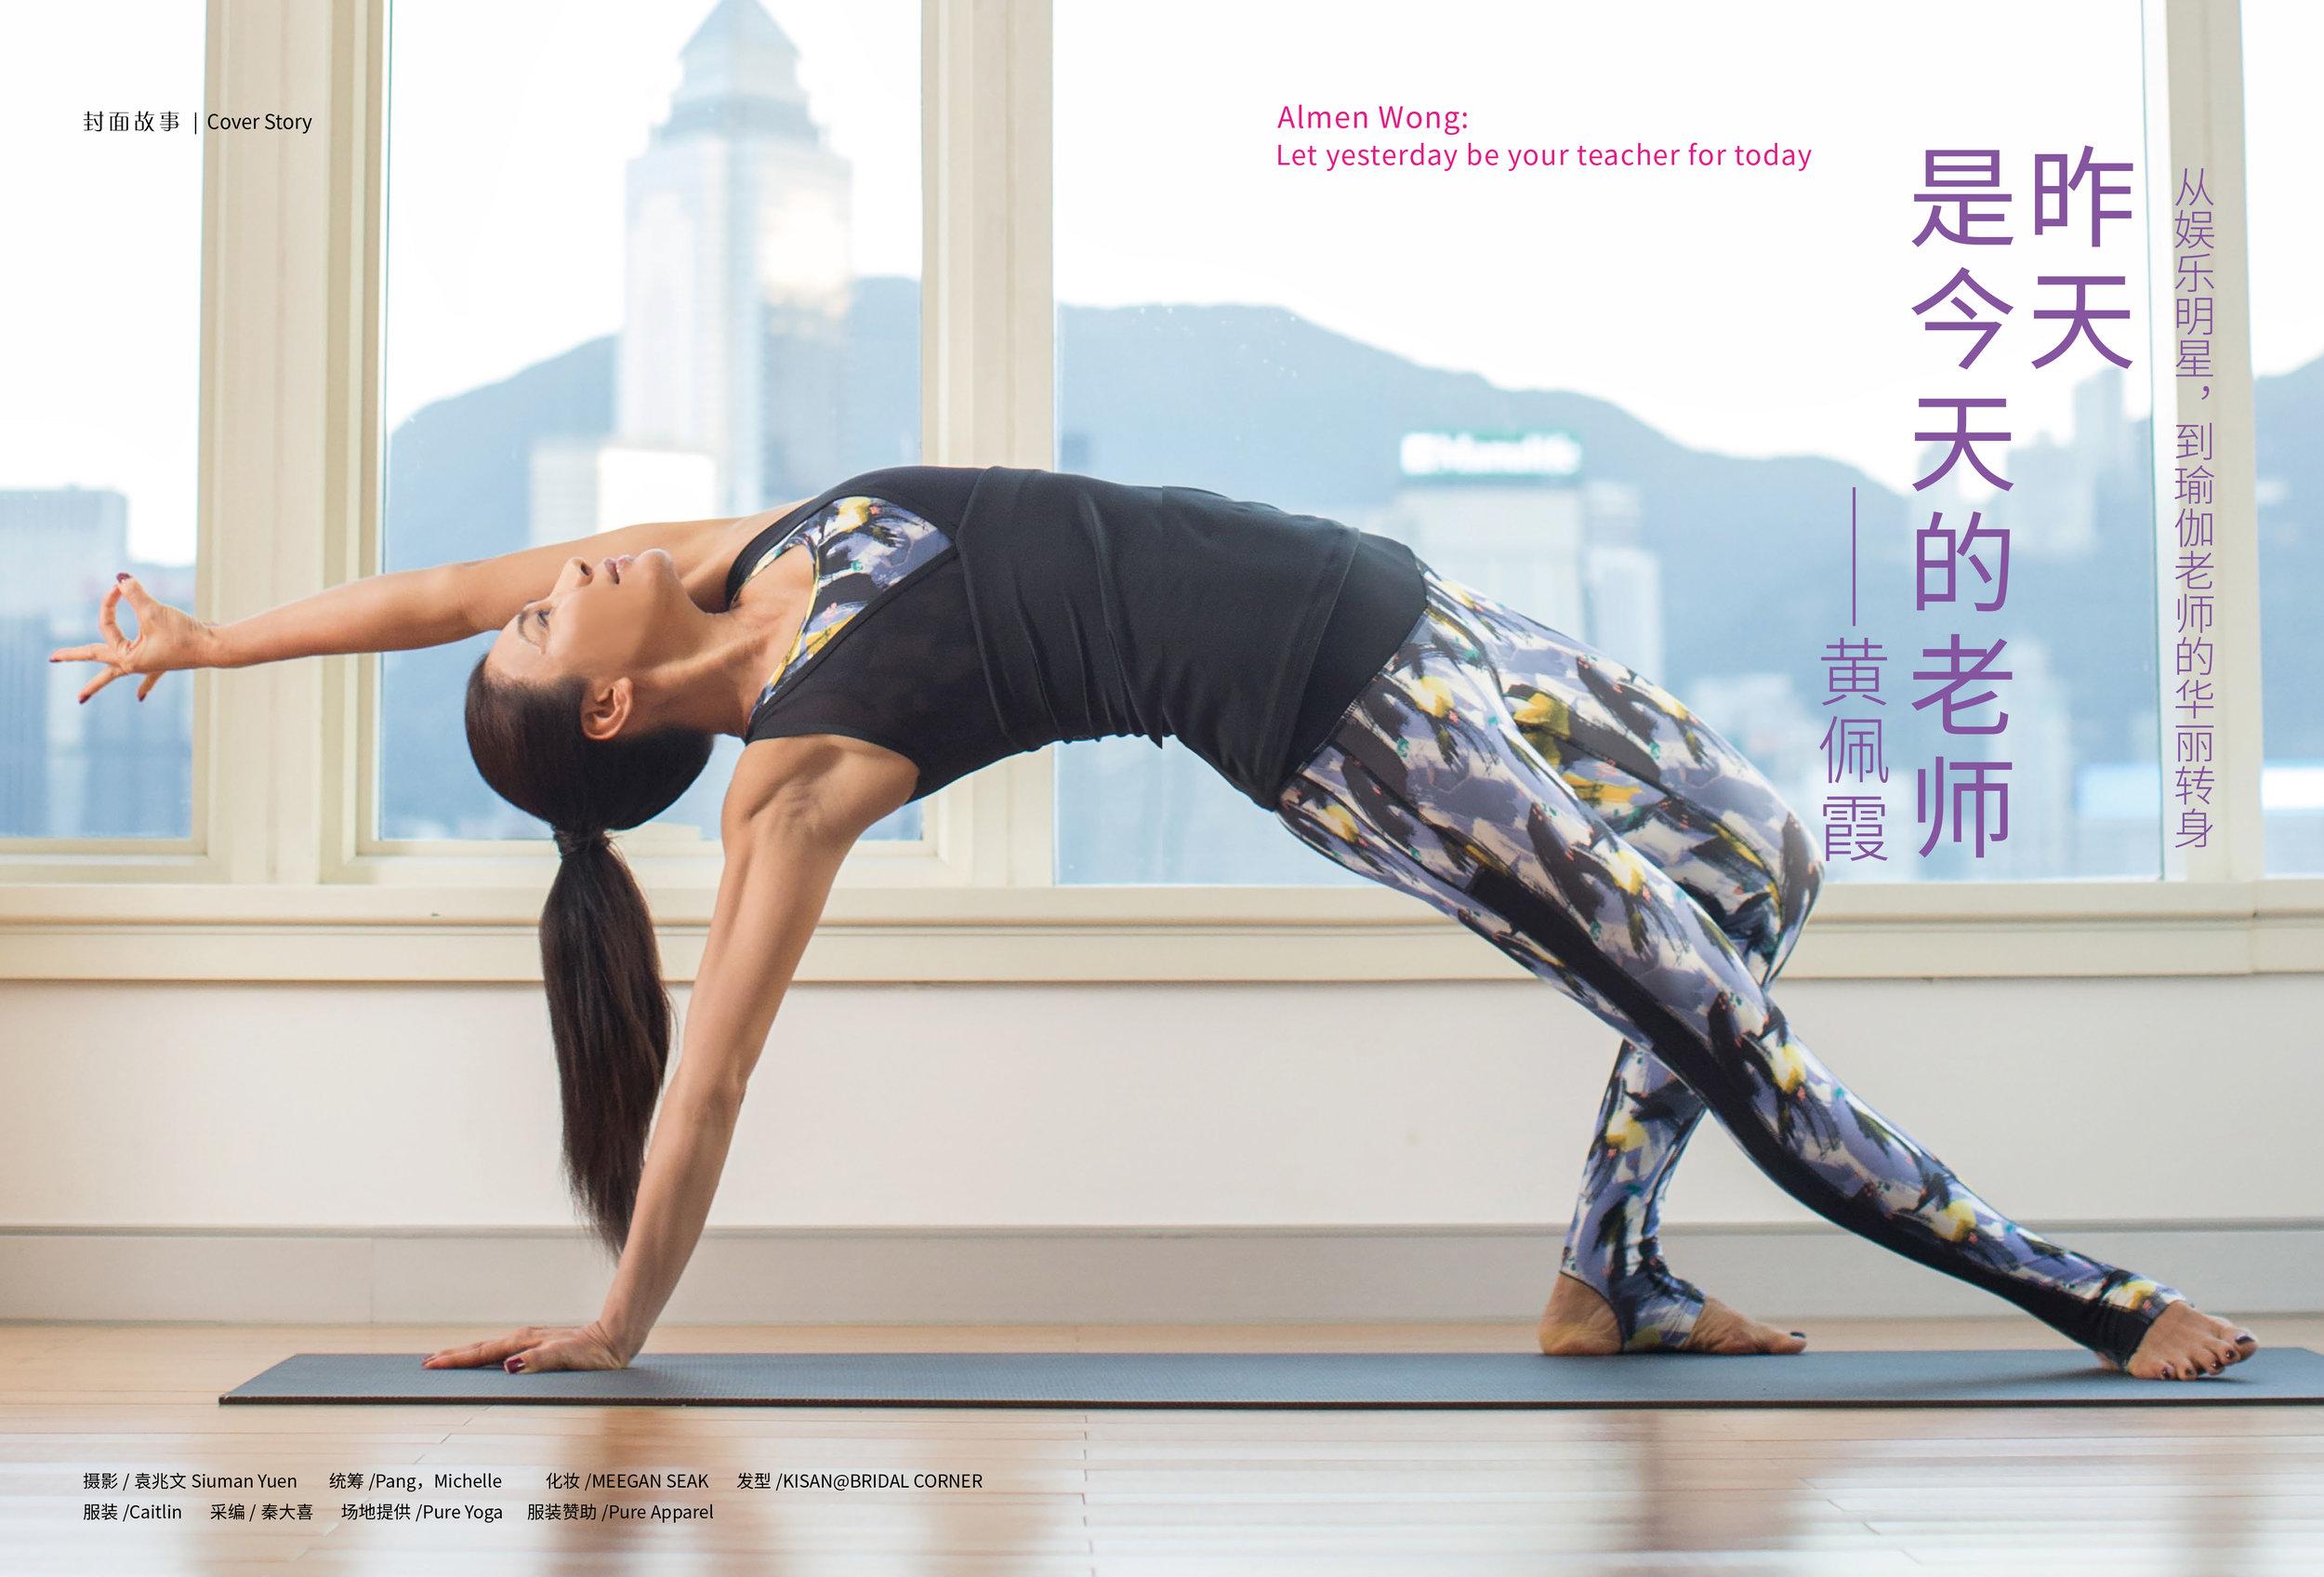 Yogajournal Coverstory Almen Wong01.jpg